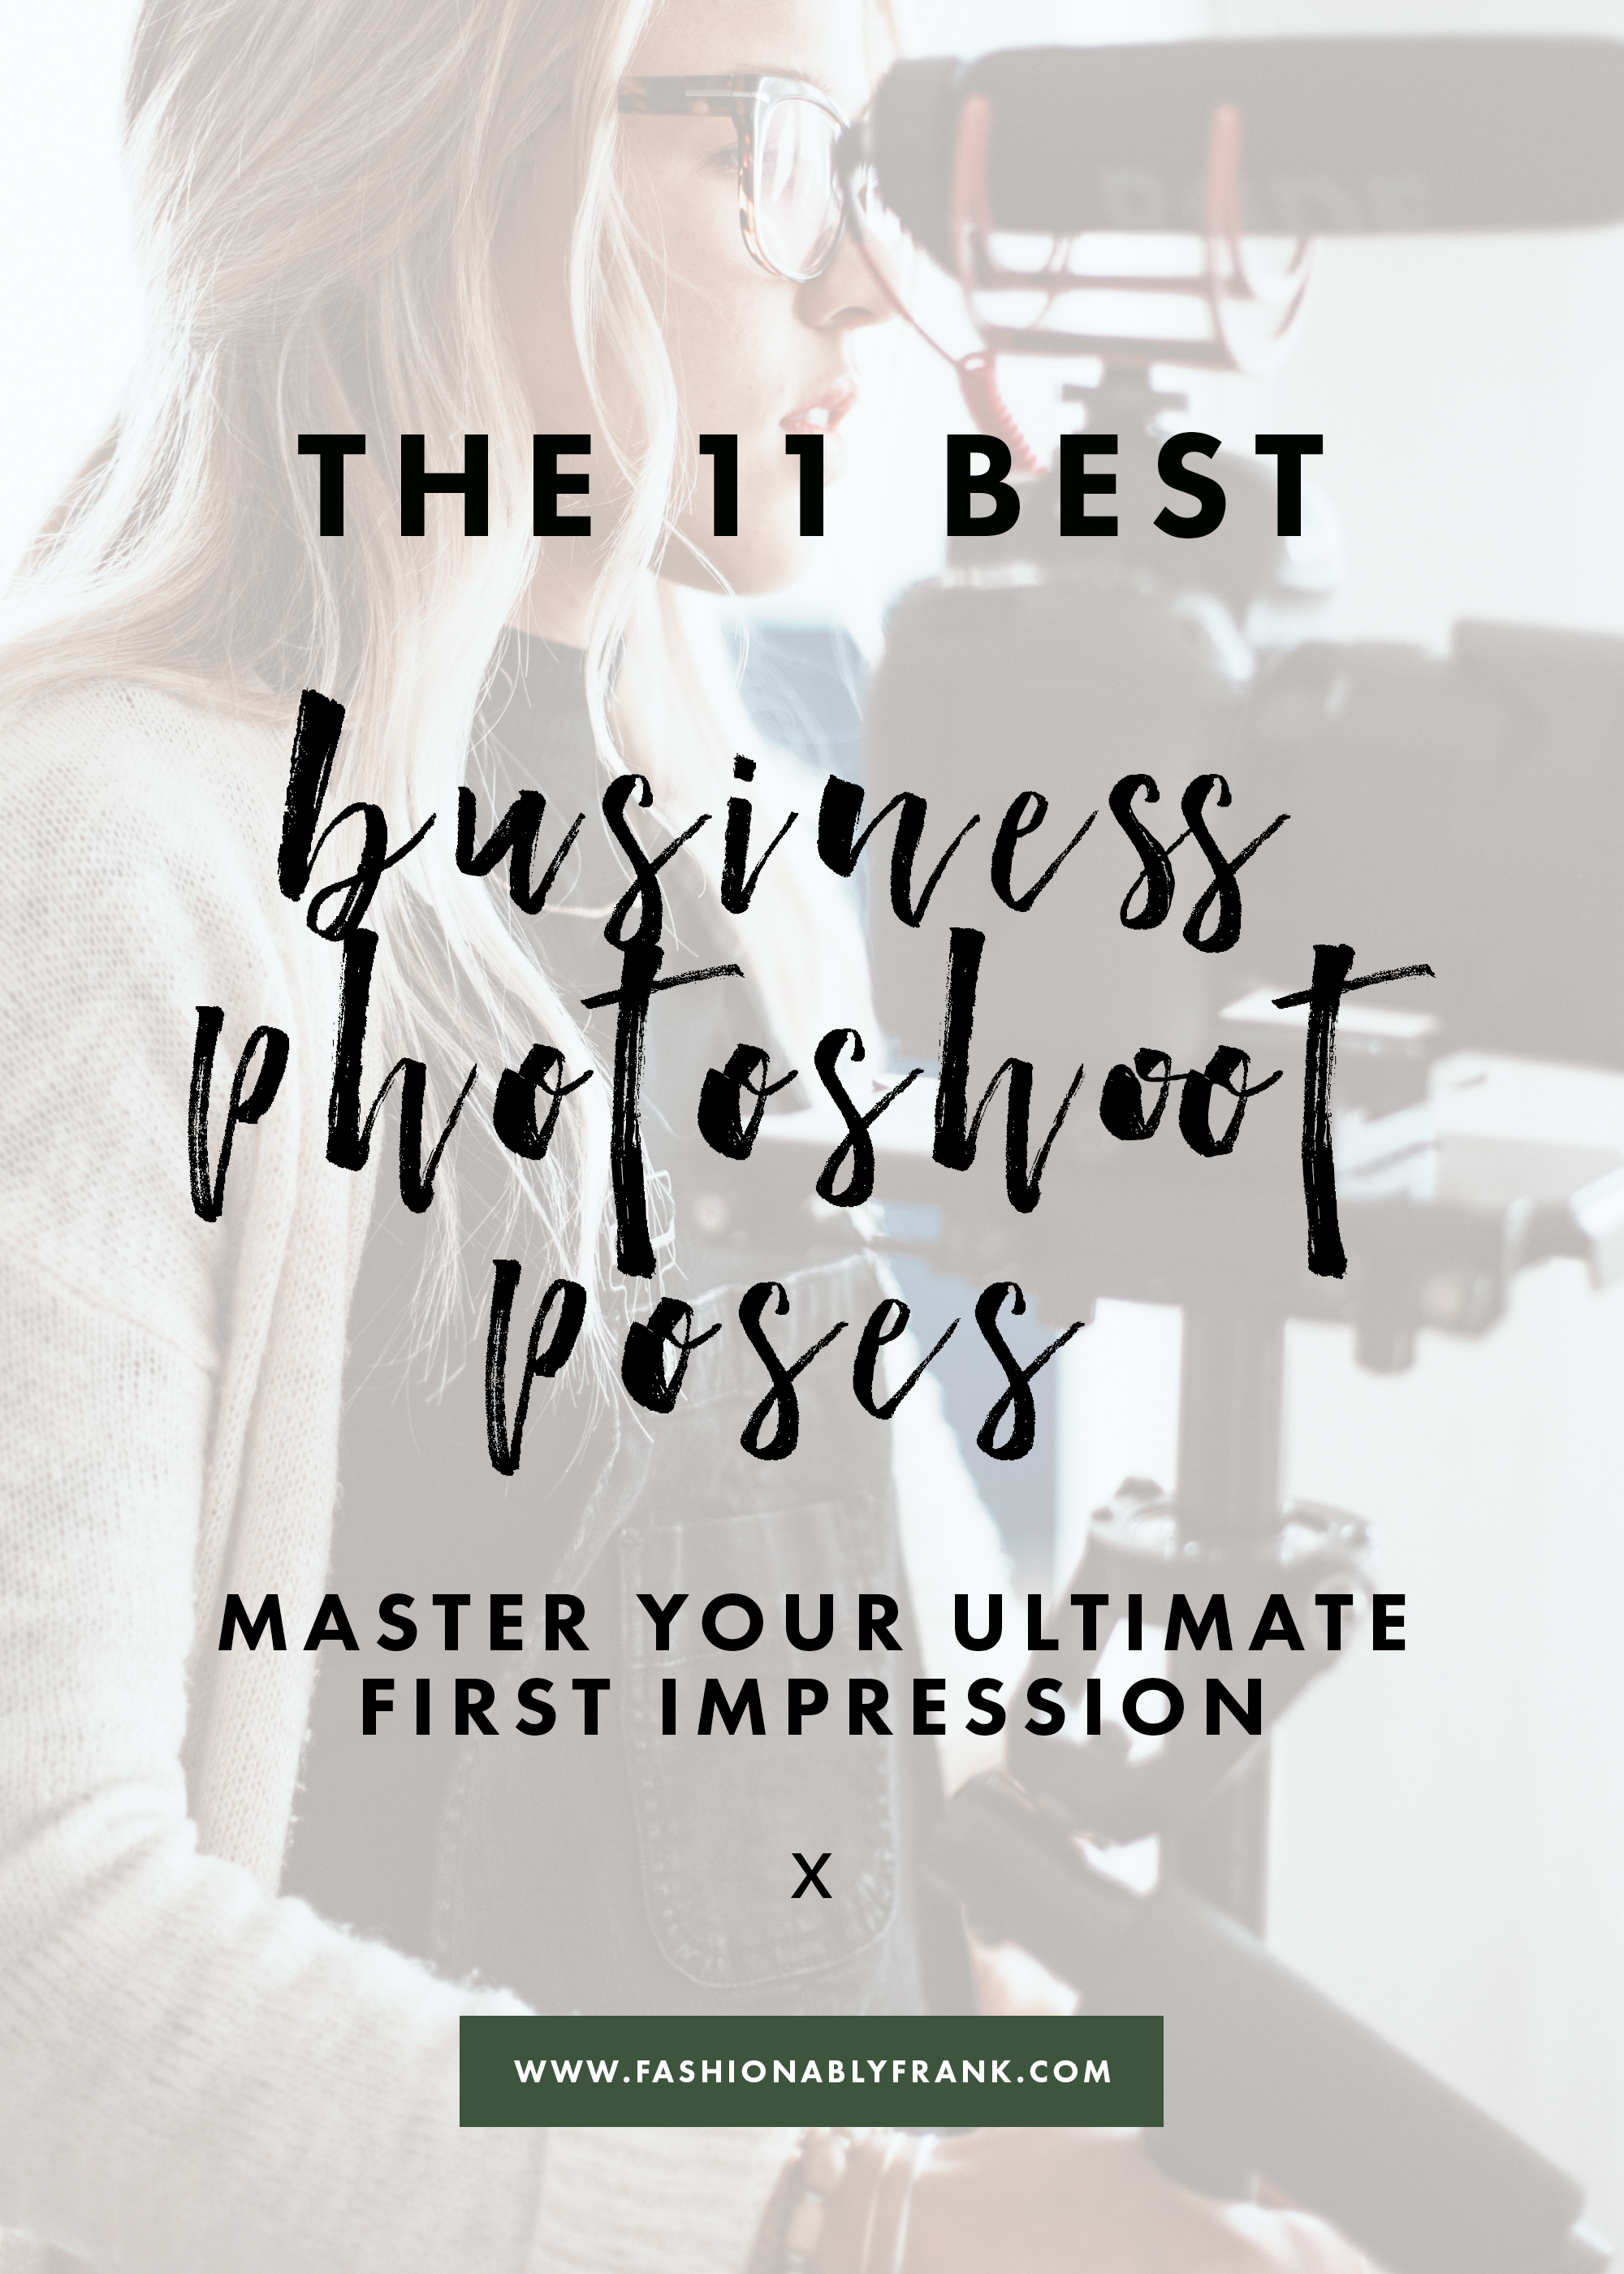 Business Photoshoot Poses